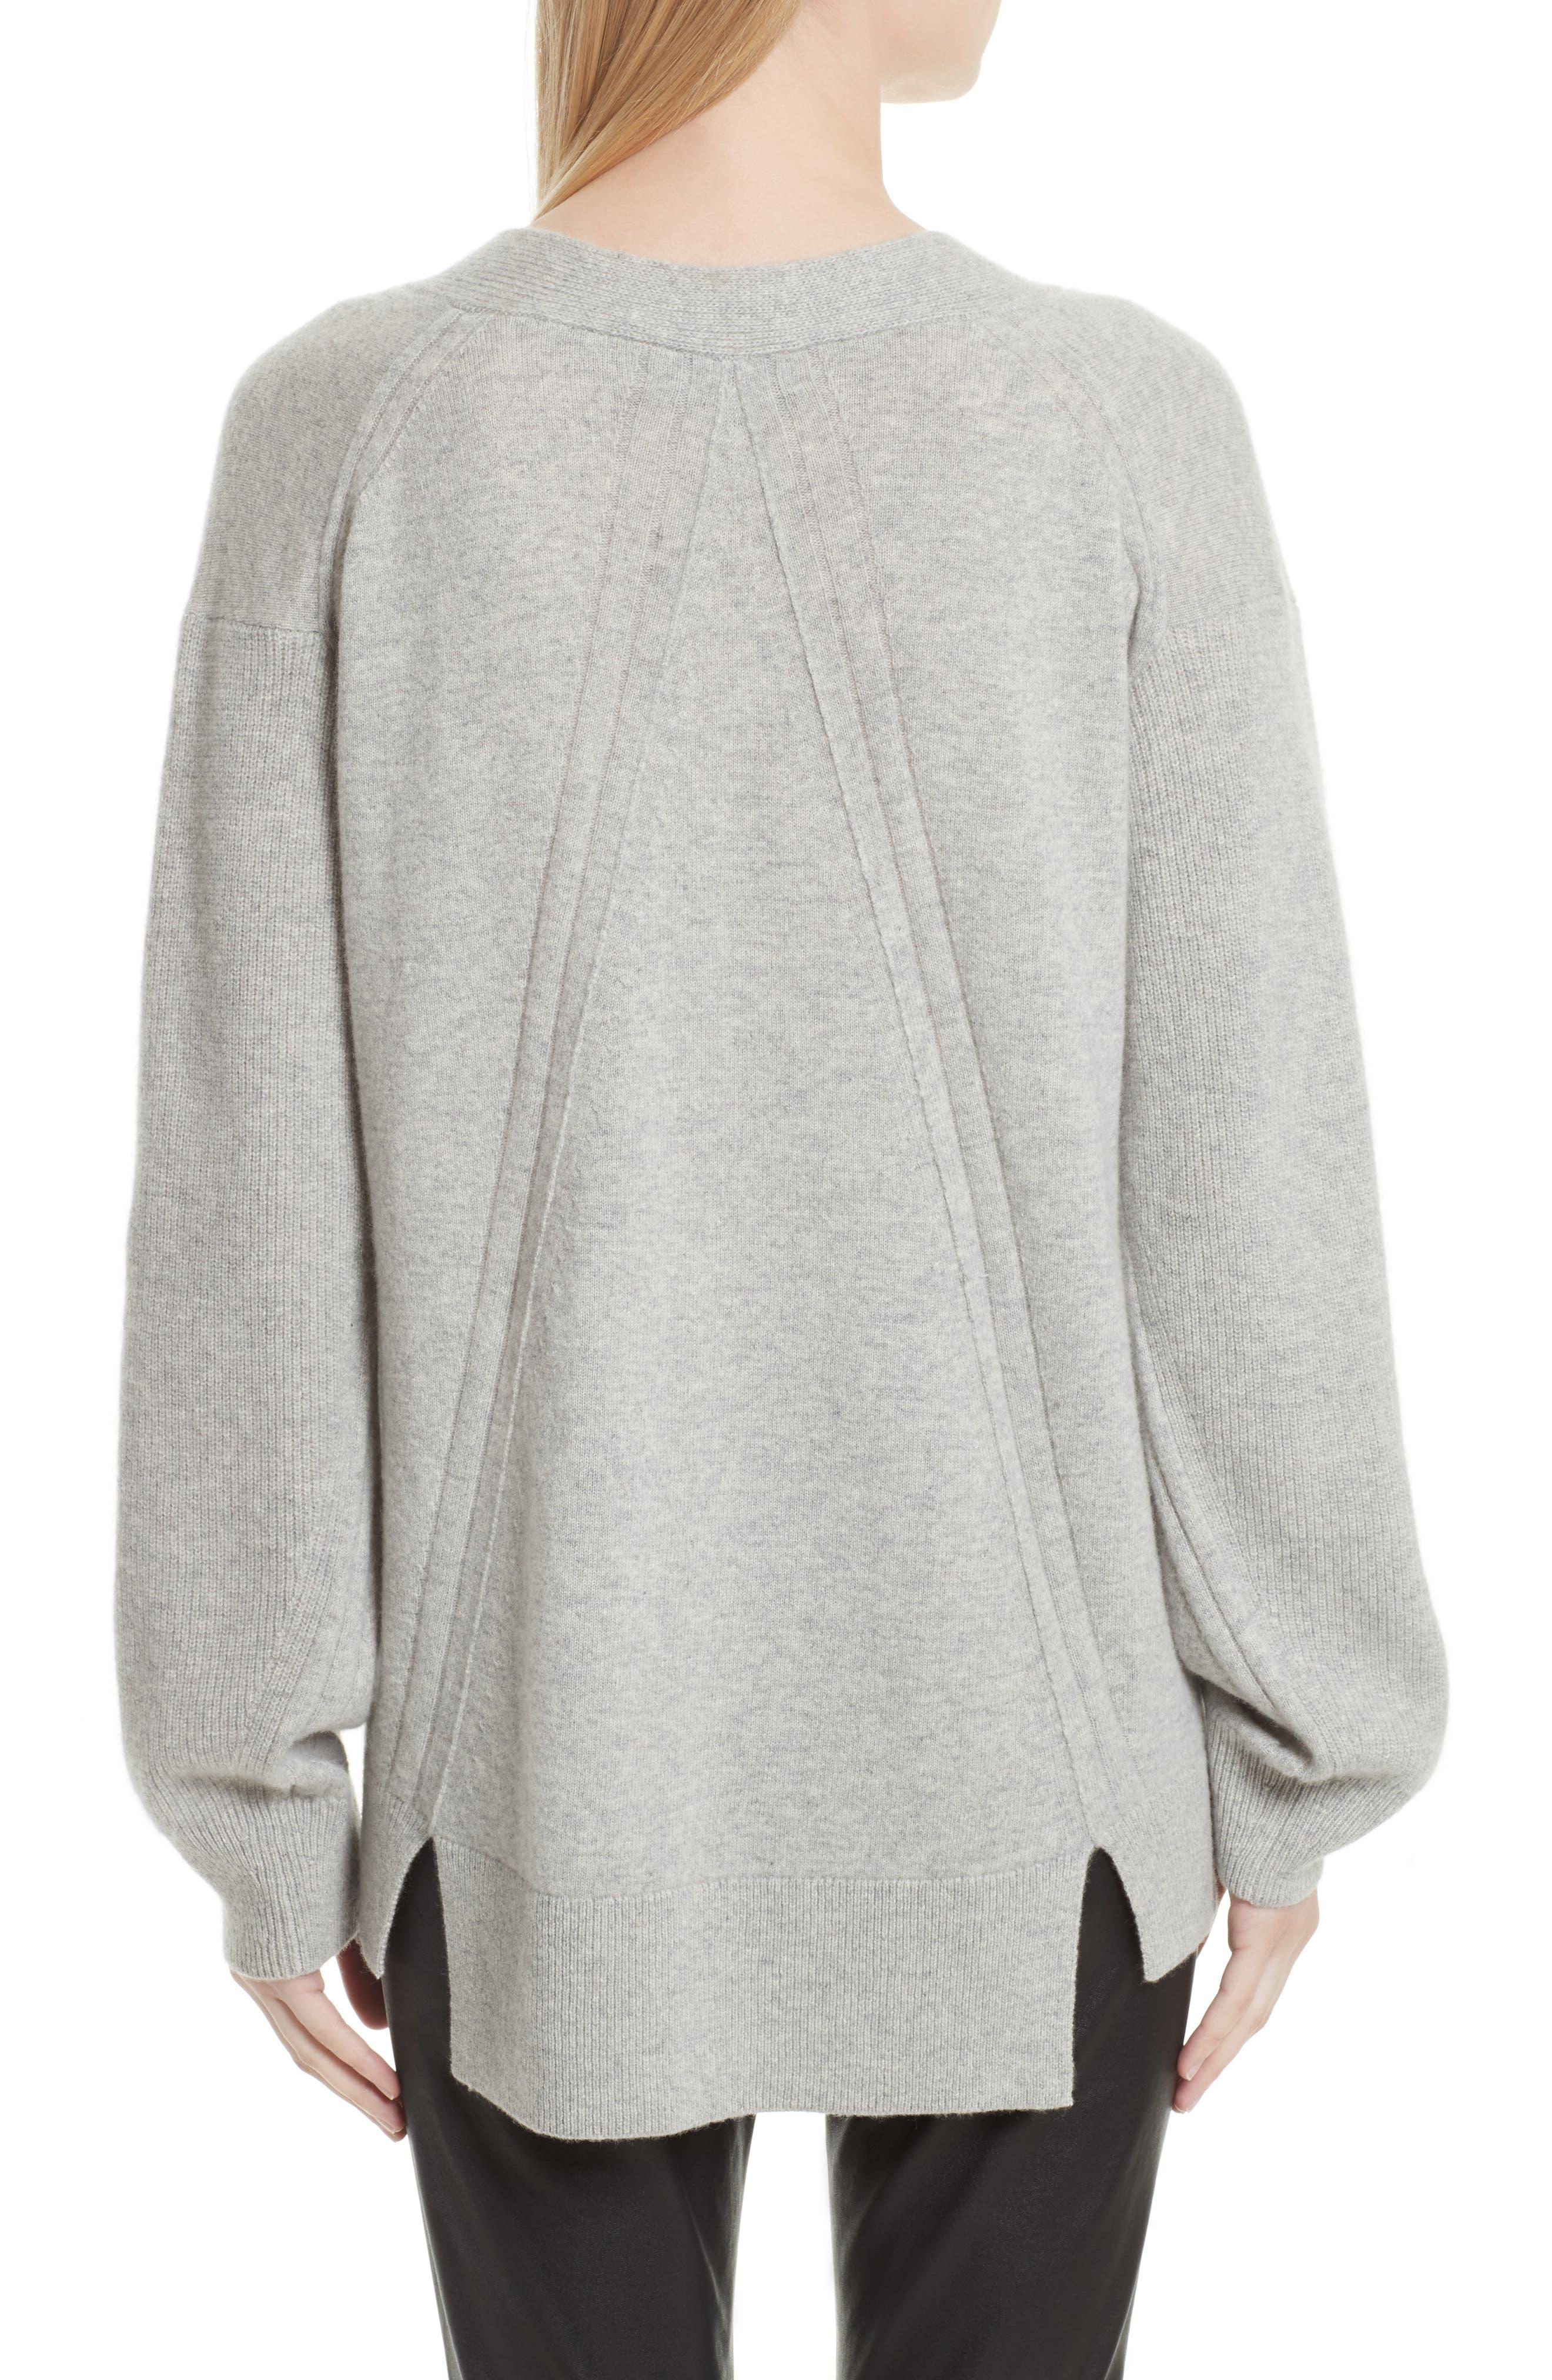 Ace Cashmere Sweater,                             Alternate thumbnail 2, color,                             058